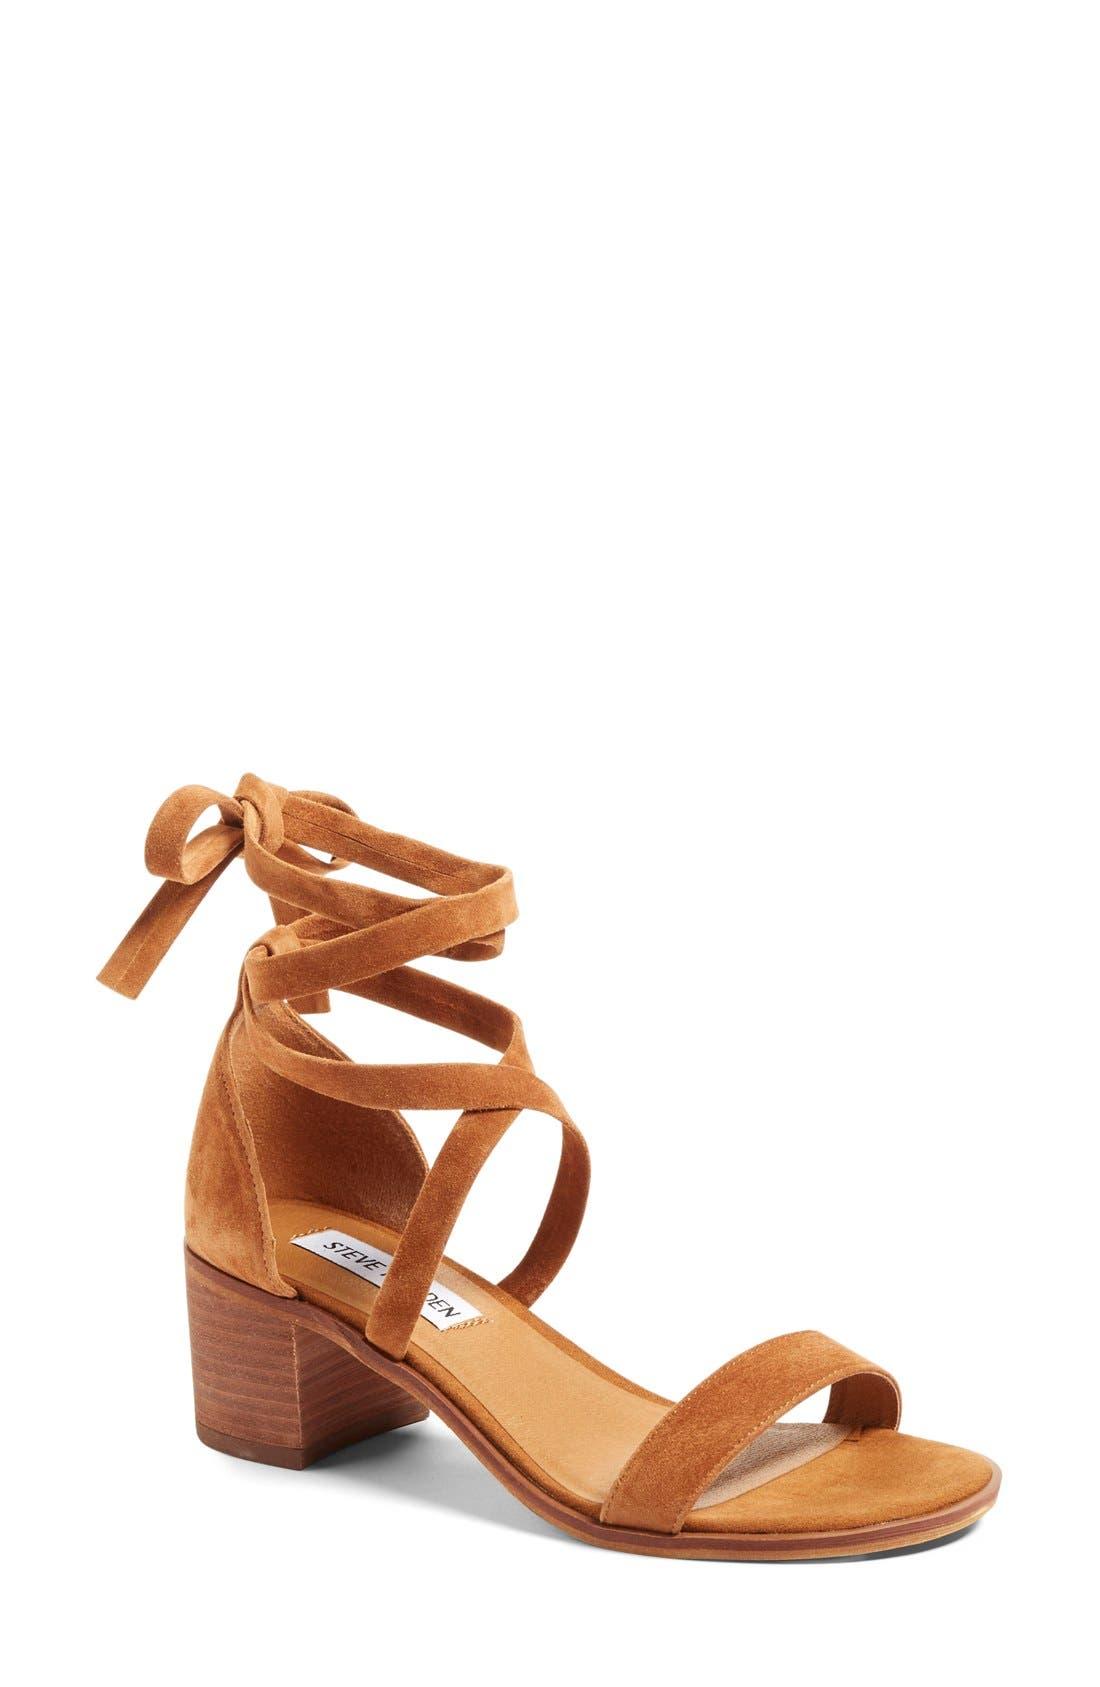 Main Image - Steve Madden 'Rizzaa' Ankle Strap Sandal (Women)